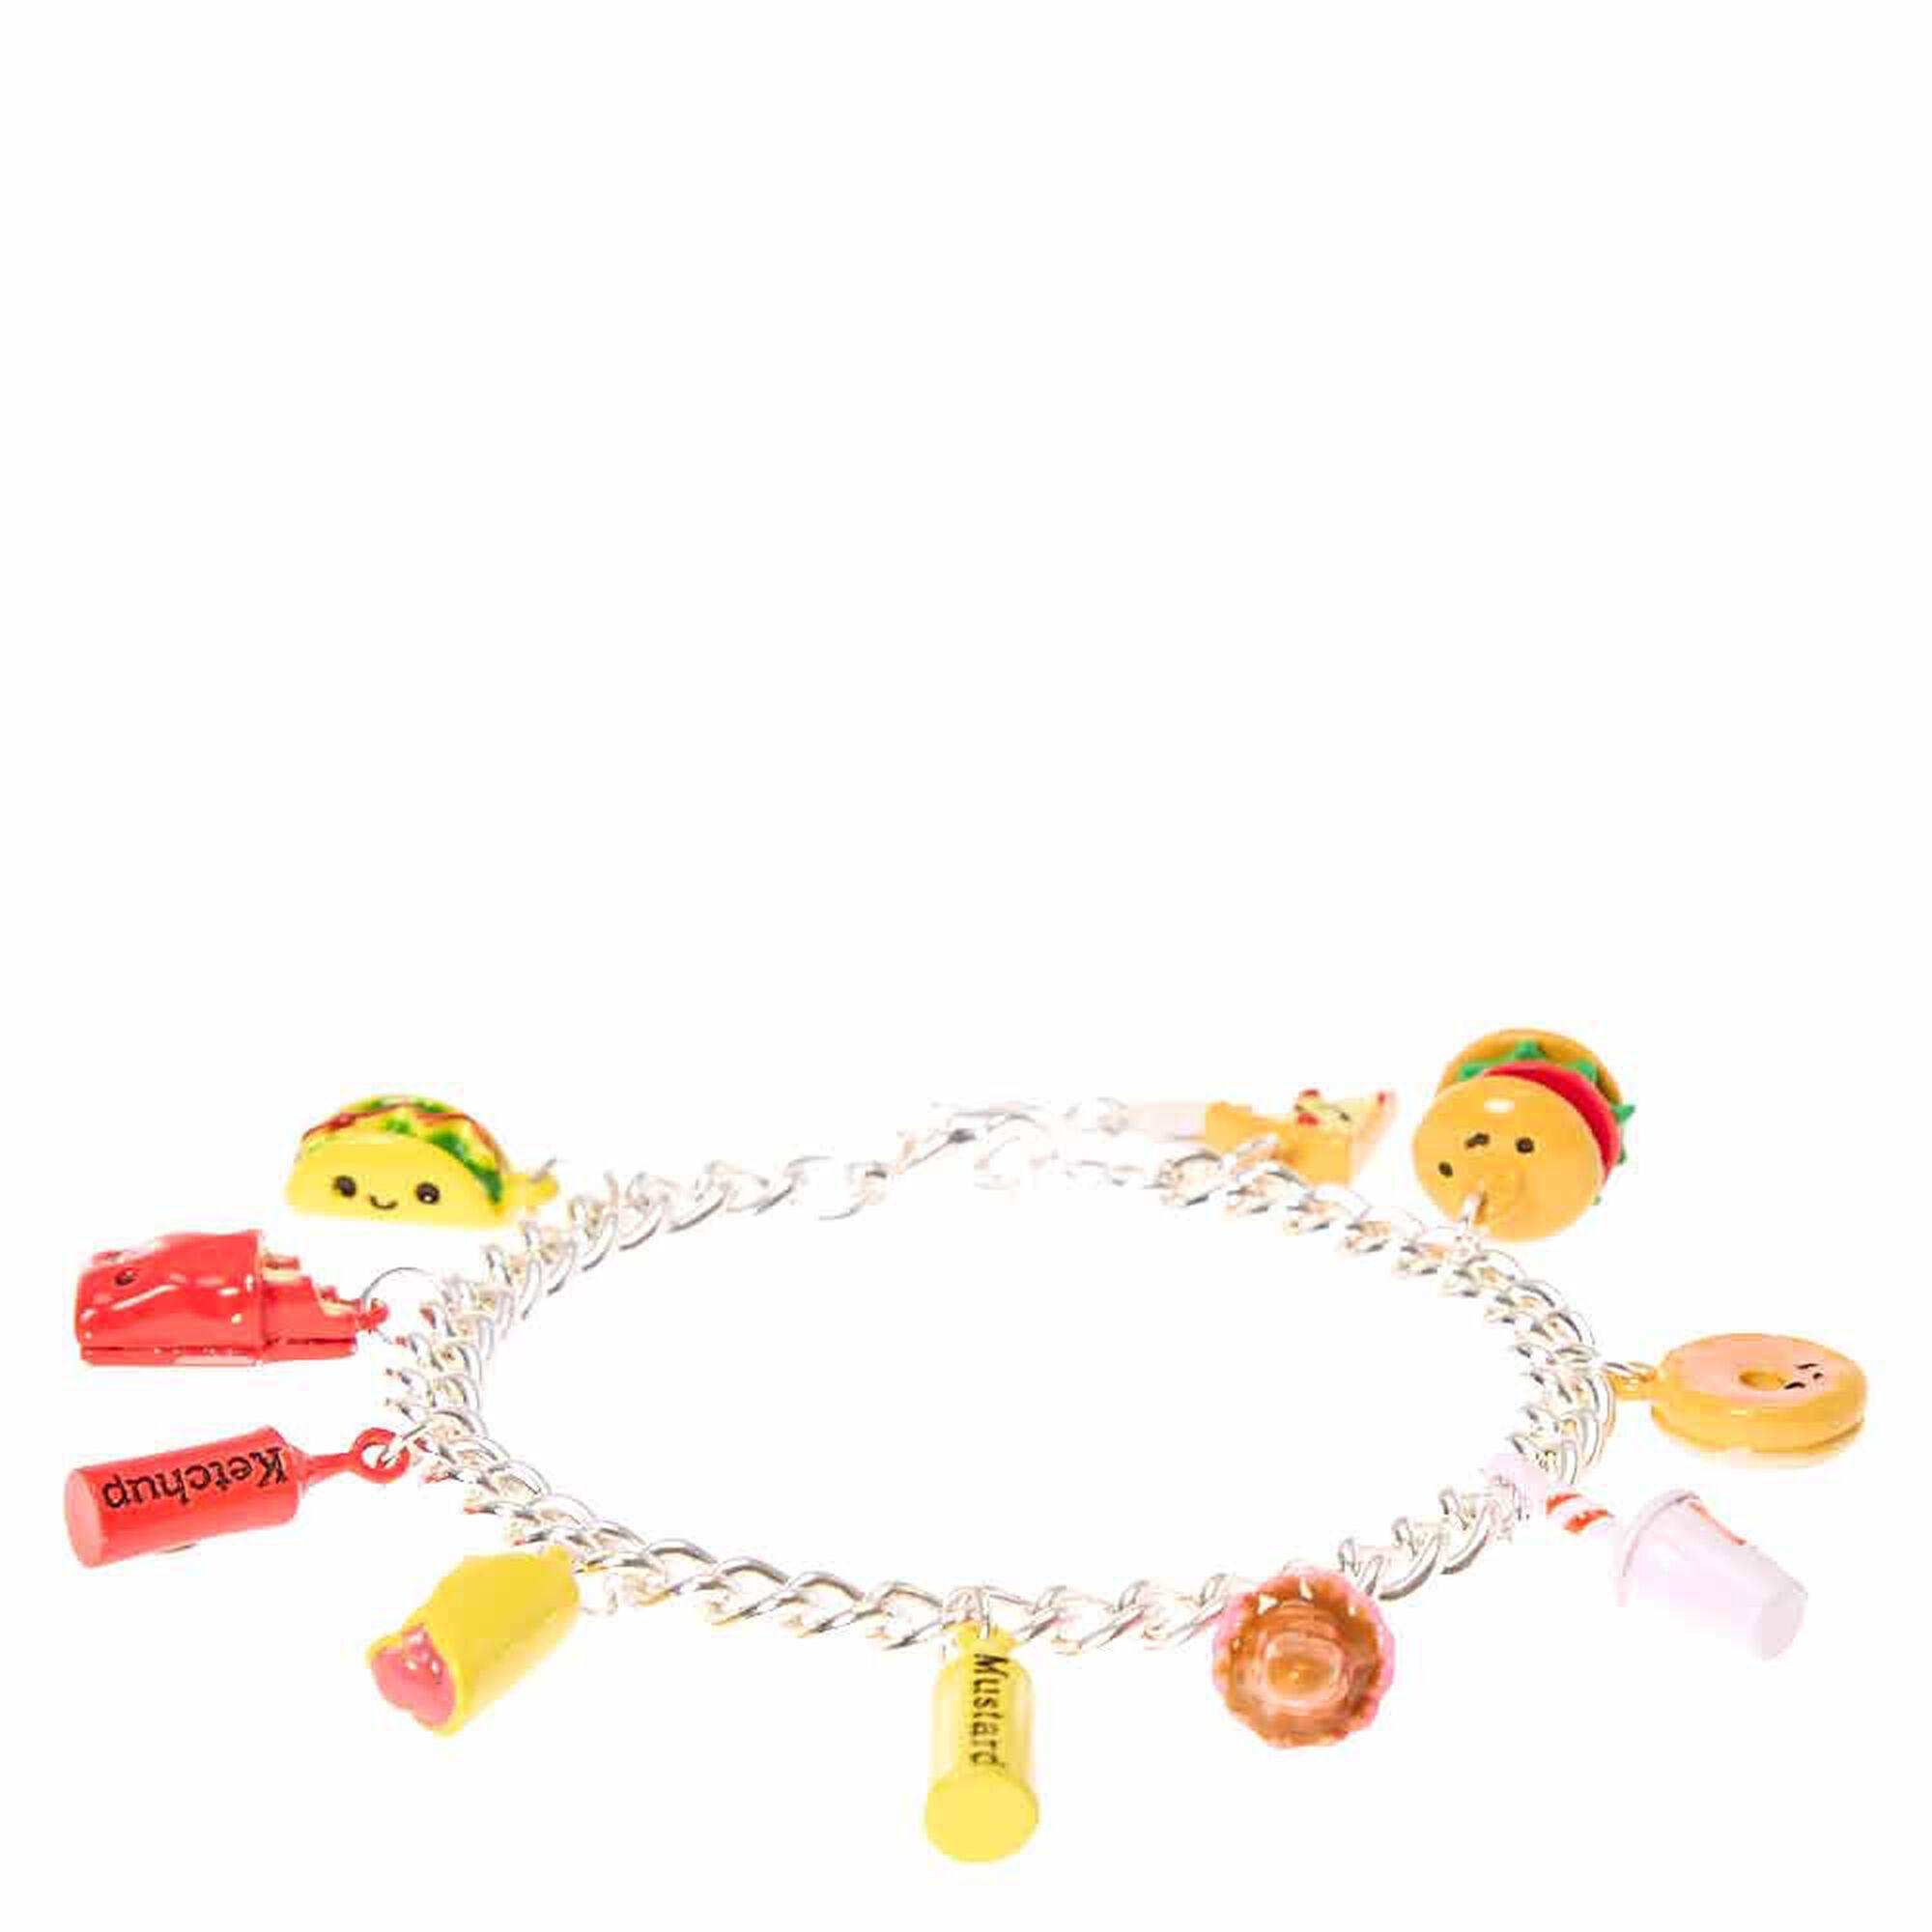 Junk Food Silver Tone Charm Bracelet